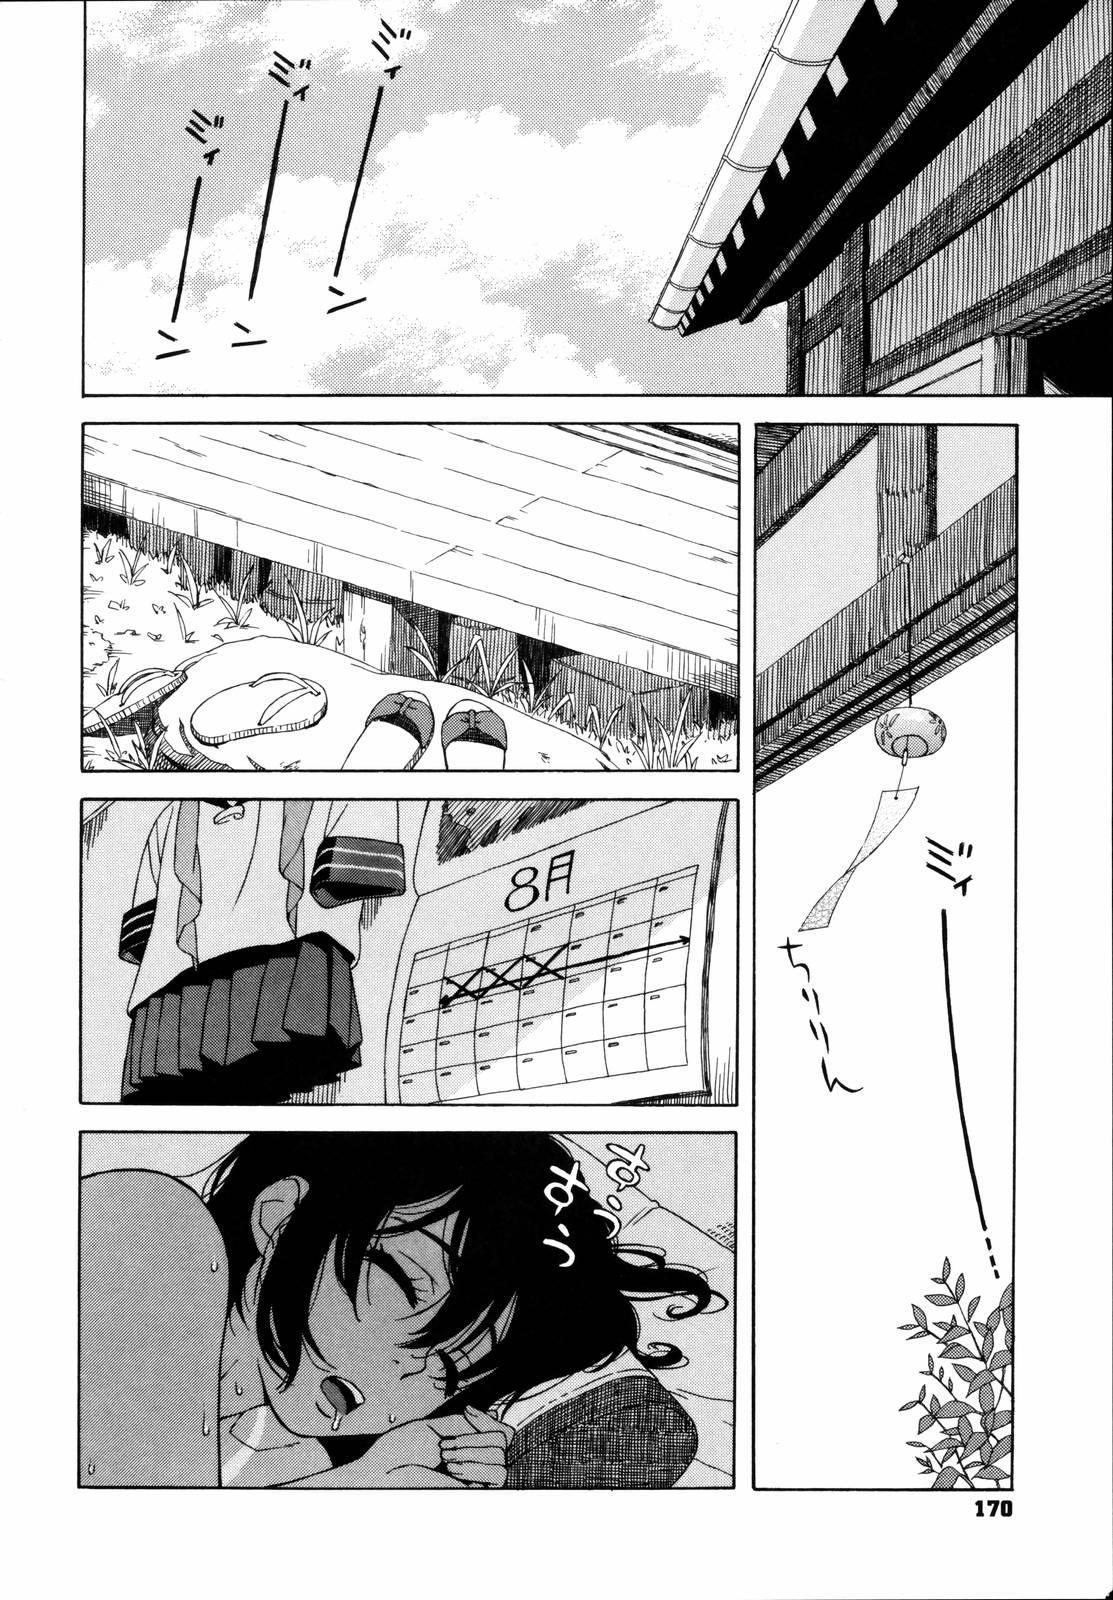 Shishunki wa Hatsujouki - Adolescence is a sexual excitement period. 171